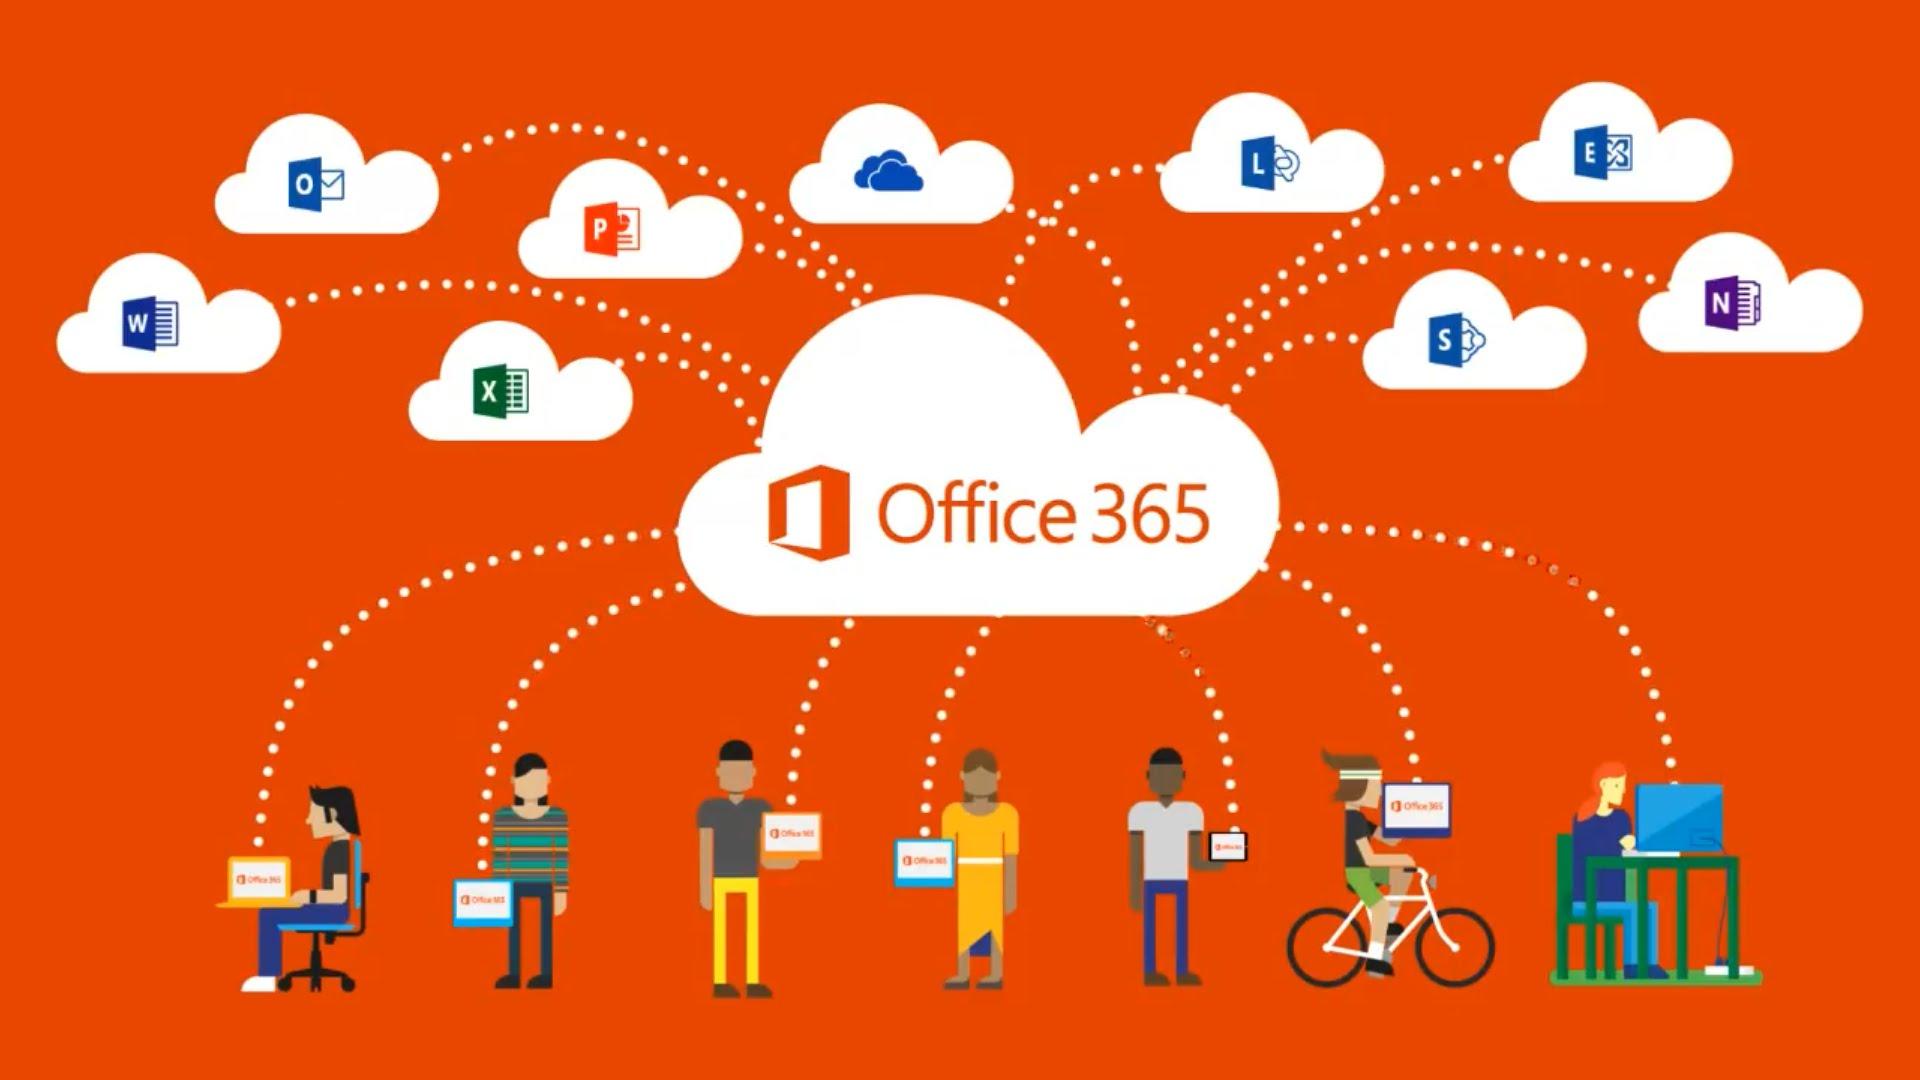 http://www.technet.com.do/images/productos-y-servicios/1Logo-Office-365.jpg